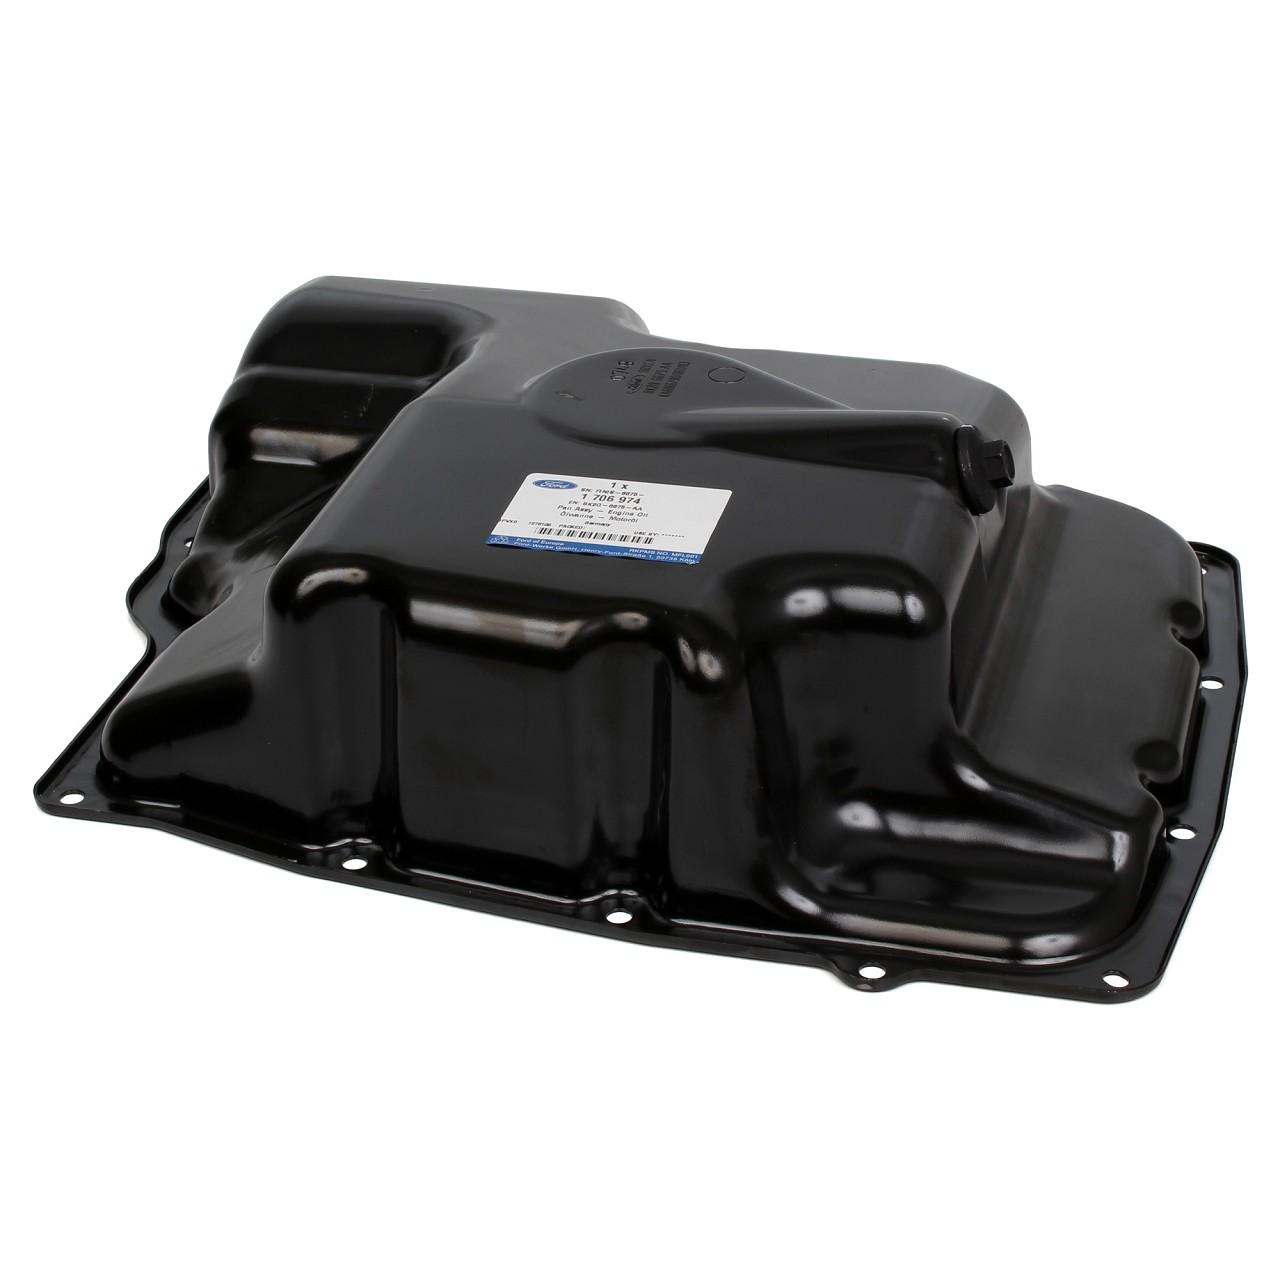 ORIGINAL Ford Ölwanne Motorölwanne MONDEO III MK3 2.0 TDCi 2.2 TDCi 1706974